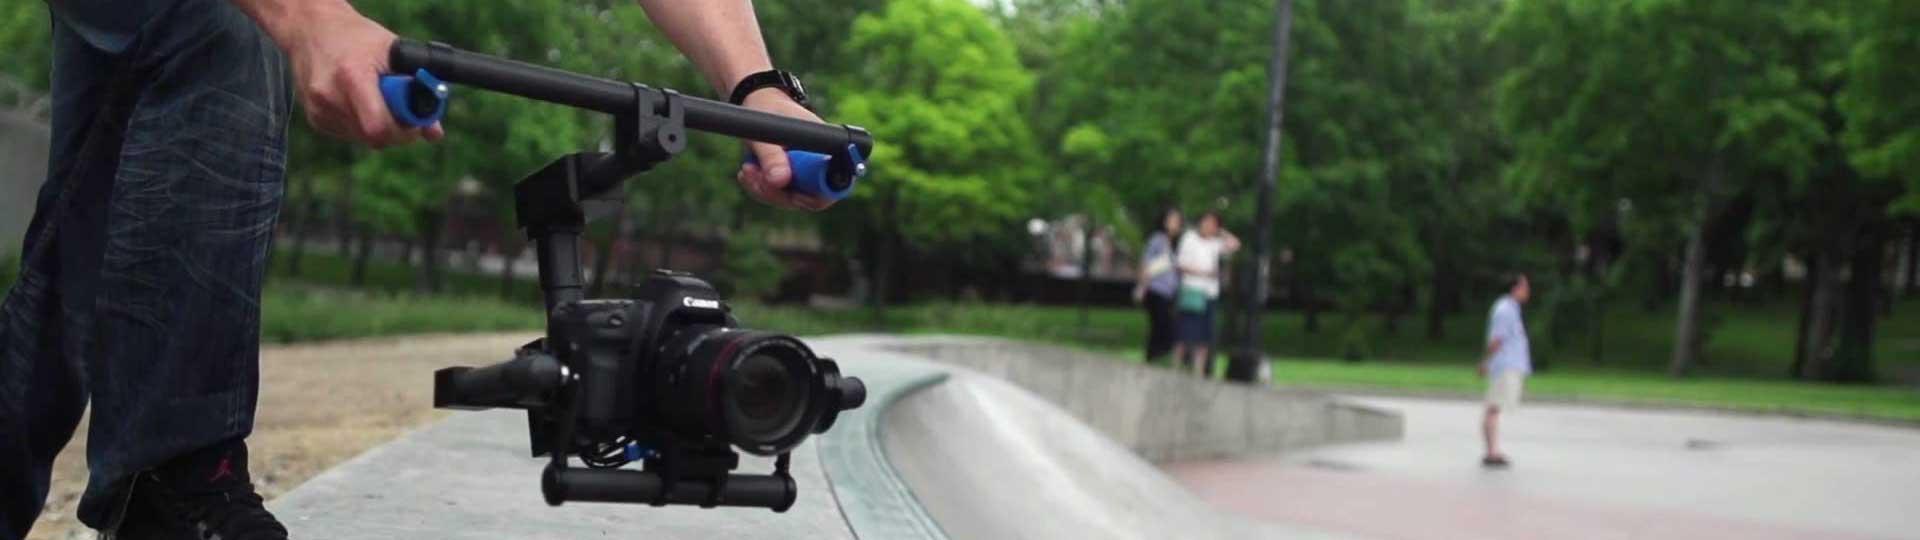 jual stabilizer kamera harga murah toko kamera online plazakamera jakarta dan surabaya